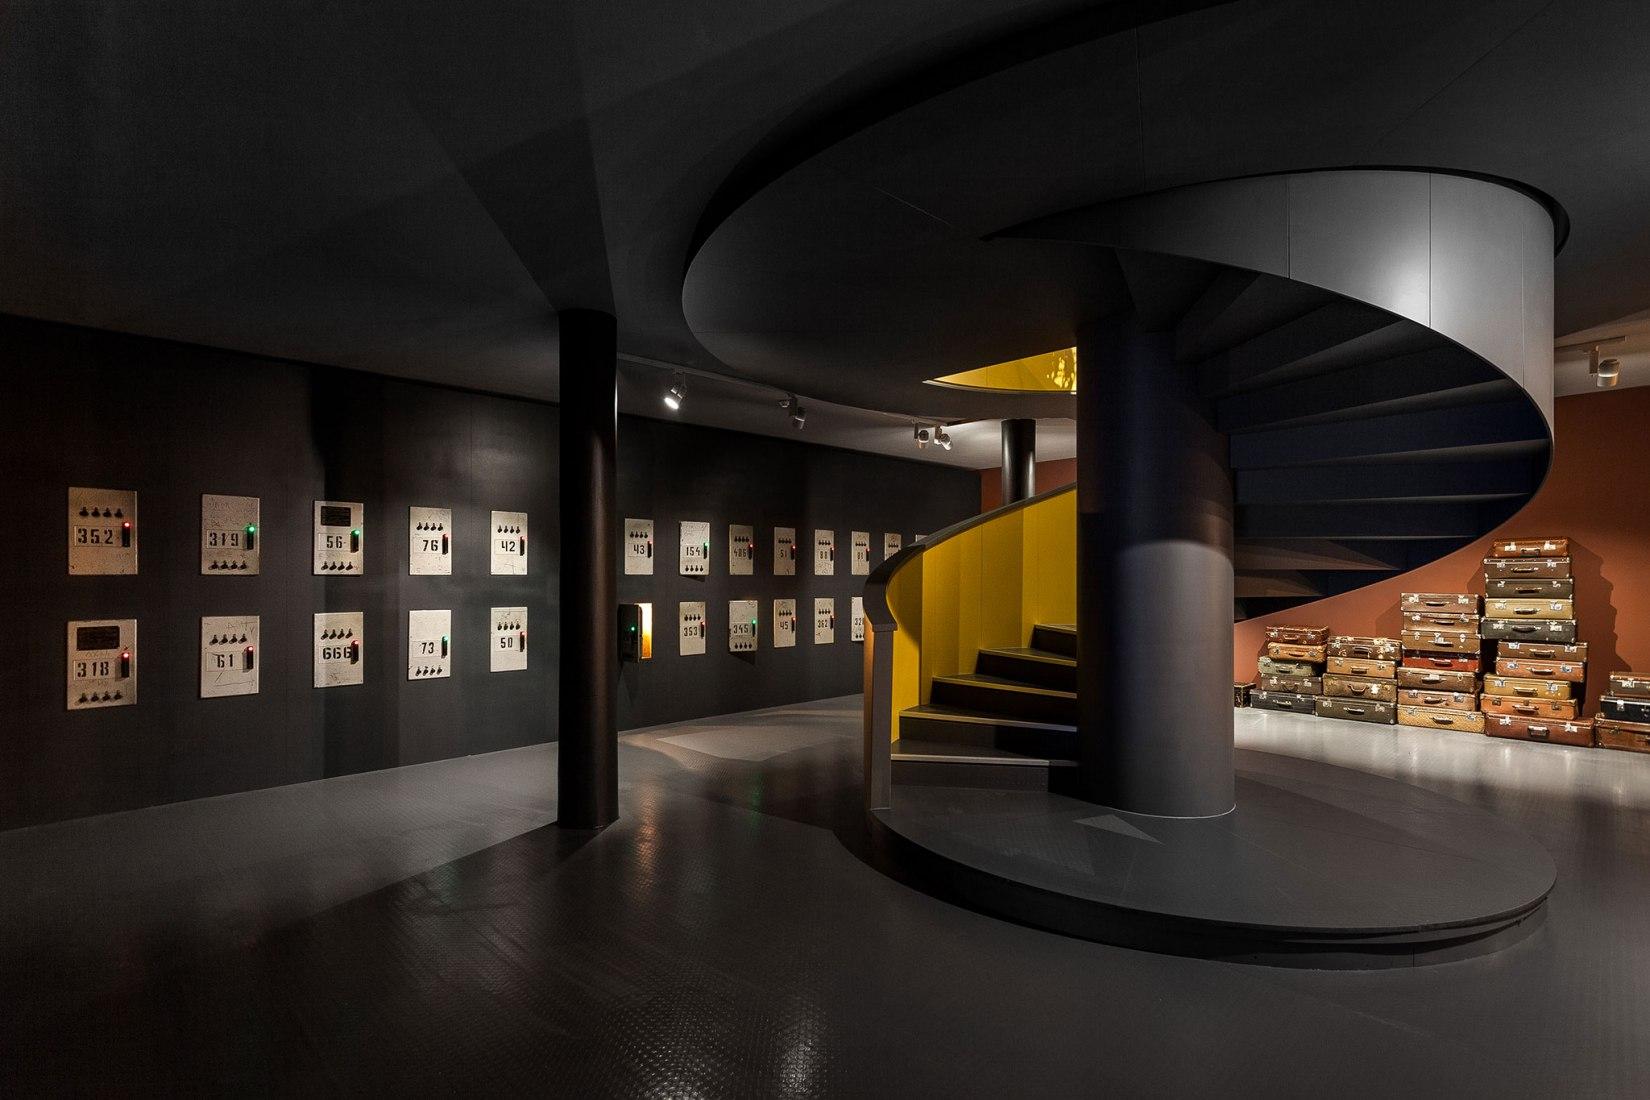 Vista interior. Estación rusa. Pabellón de Rusia para la XVI Bienal de Arquitectura de Venecia 2018. Imágen cortesía de Anna Mikheeva